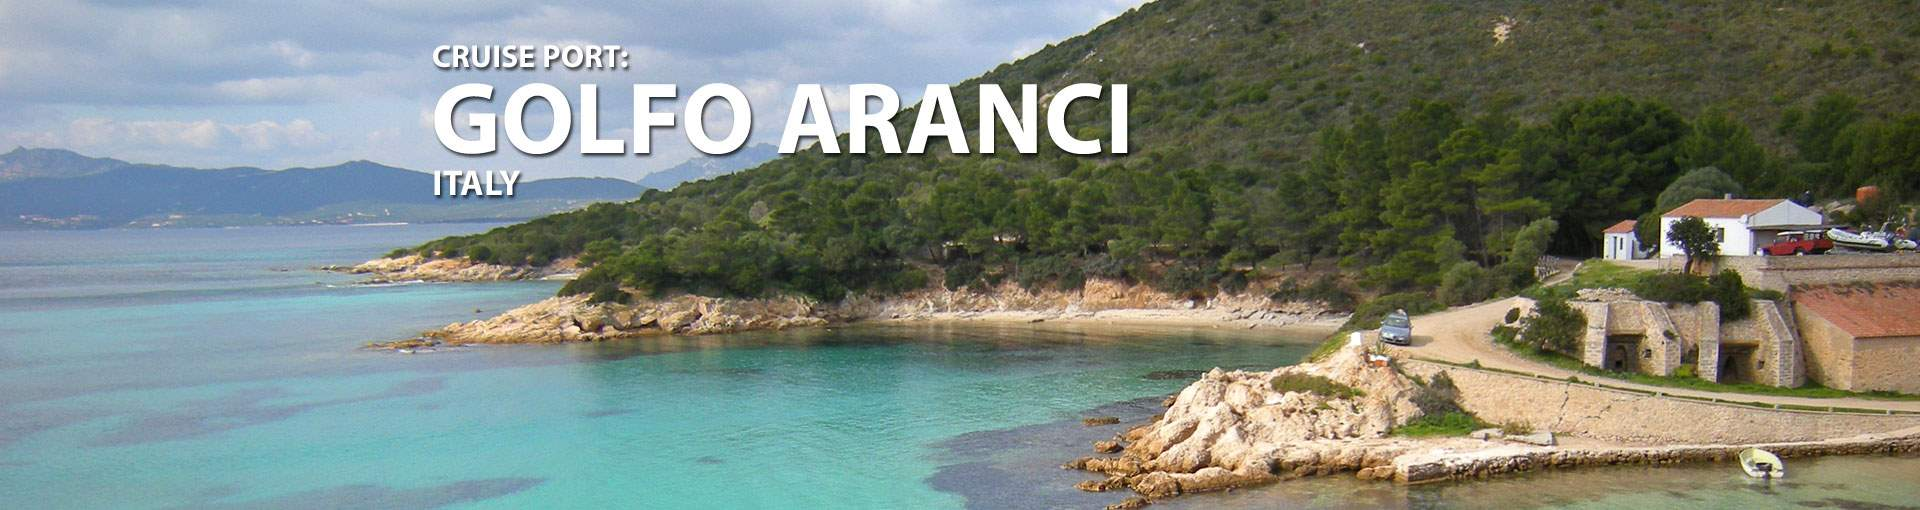 Cruises to Golfo Aranci, Italy